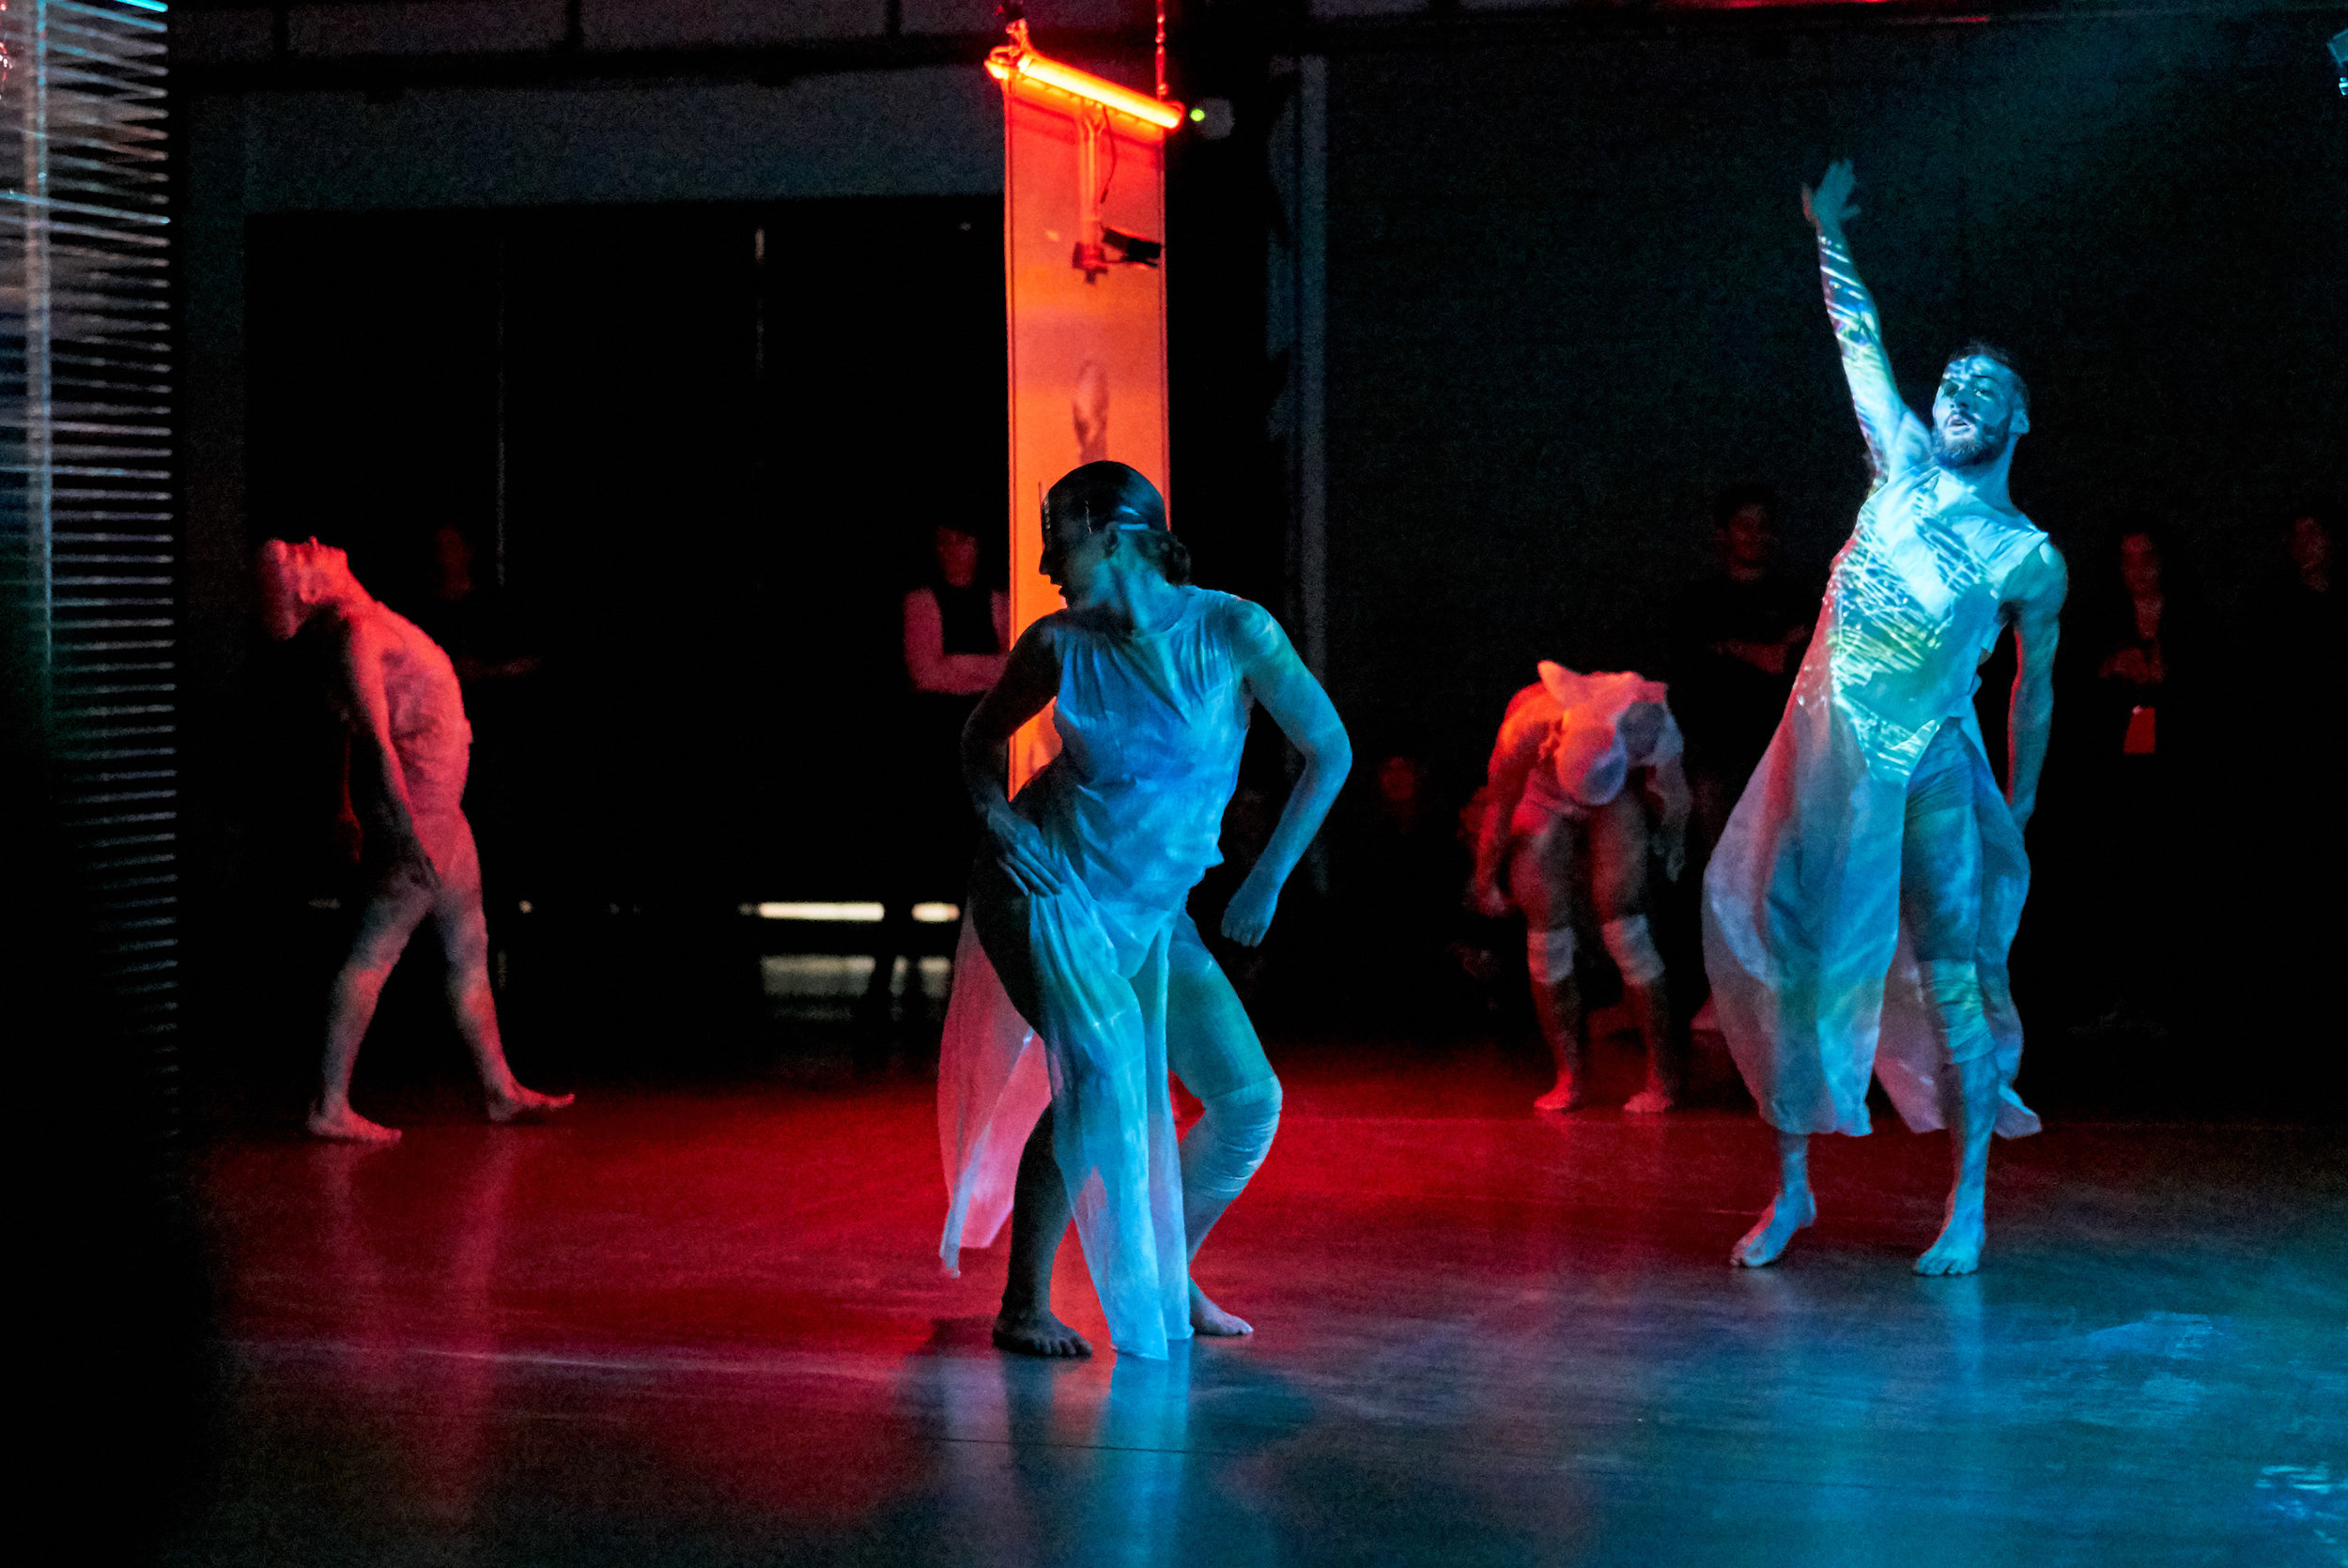 mardi-culturel-td-danse-danse-la-otra-orilla-van-grimde-corps-secrets-15.jpg